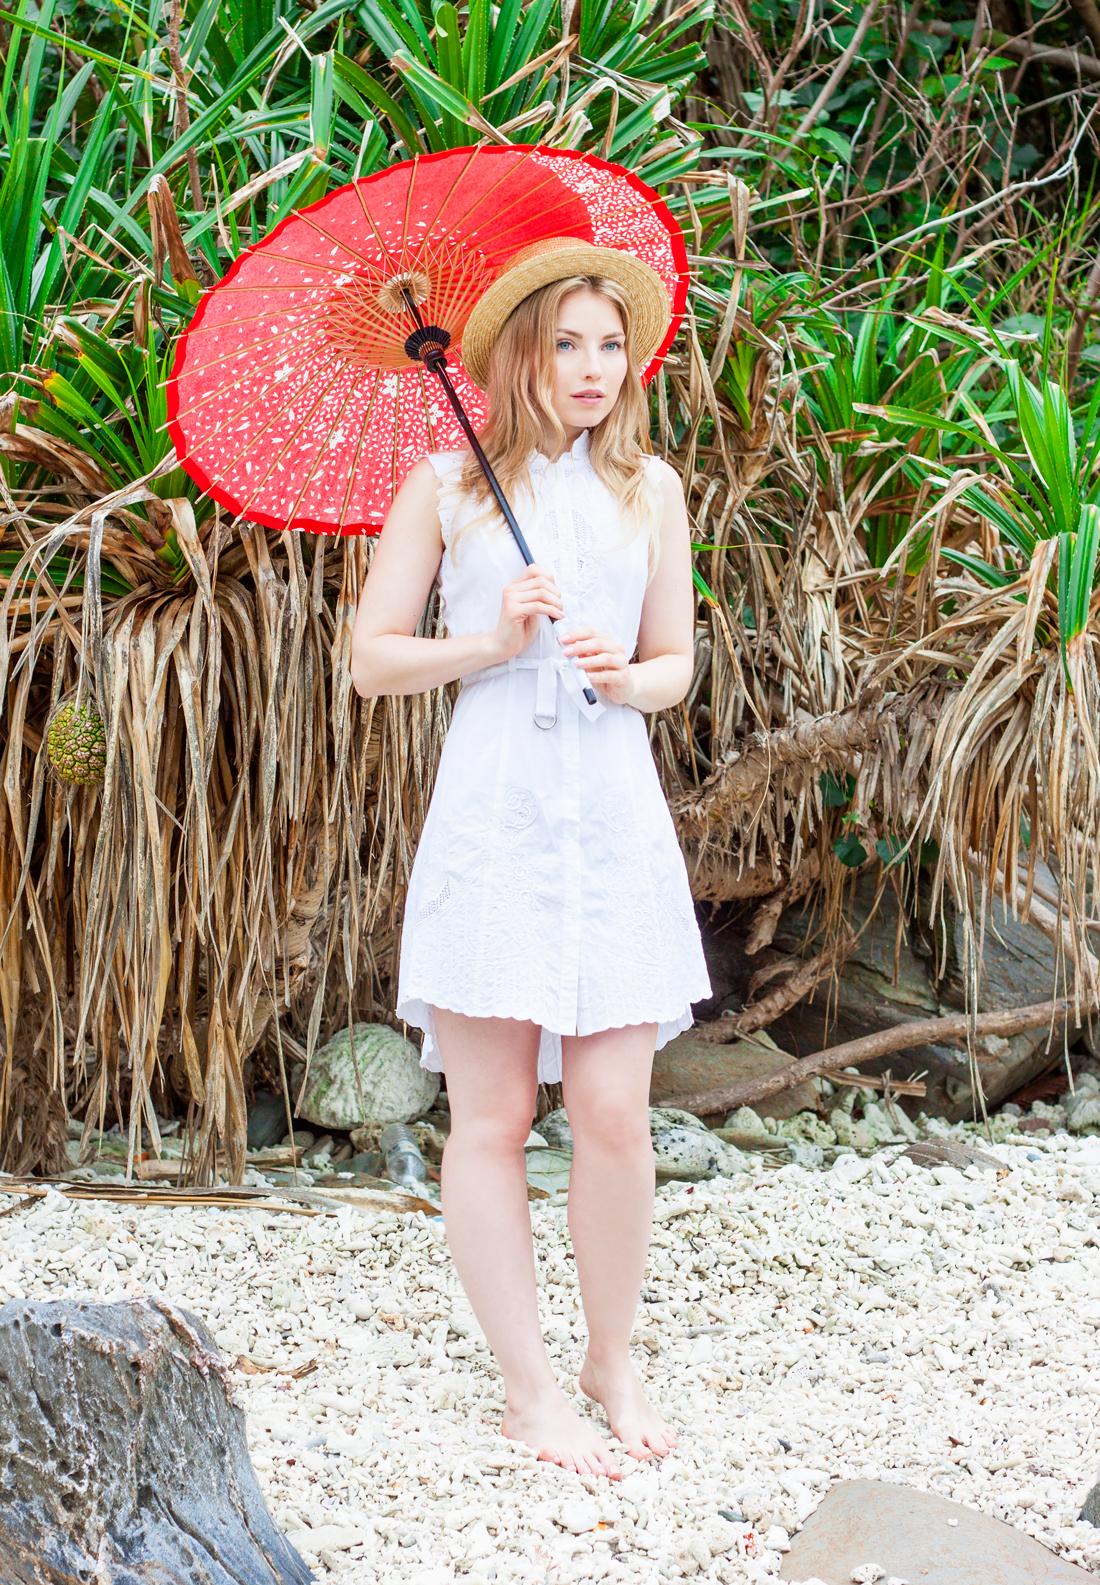 Chloe dress, chloe embroidered dress, wages umbrella, red japanese umbrella, tokashiki island, tokashiku beach, boat hat, japan, okinawa, japanese vacation, japanese tropical beach